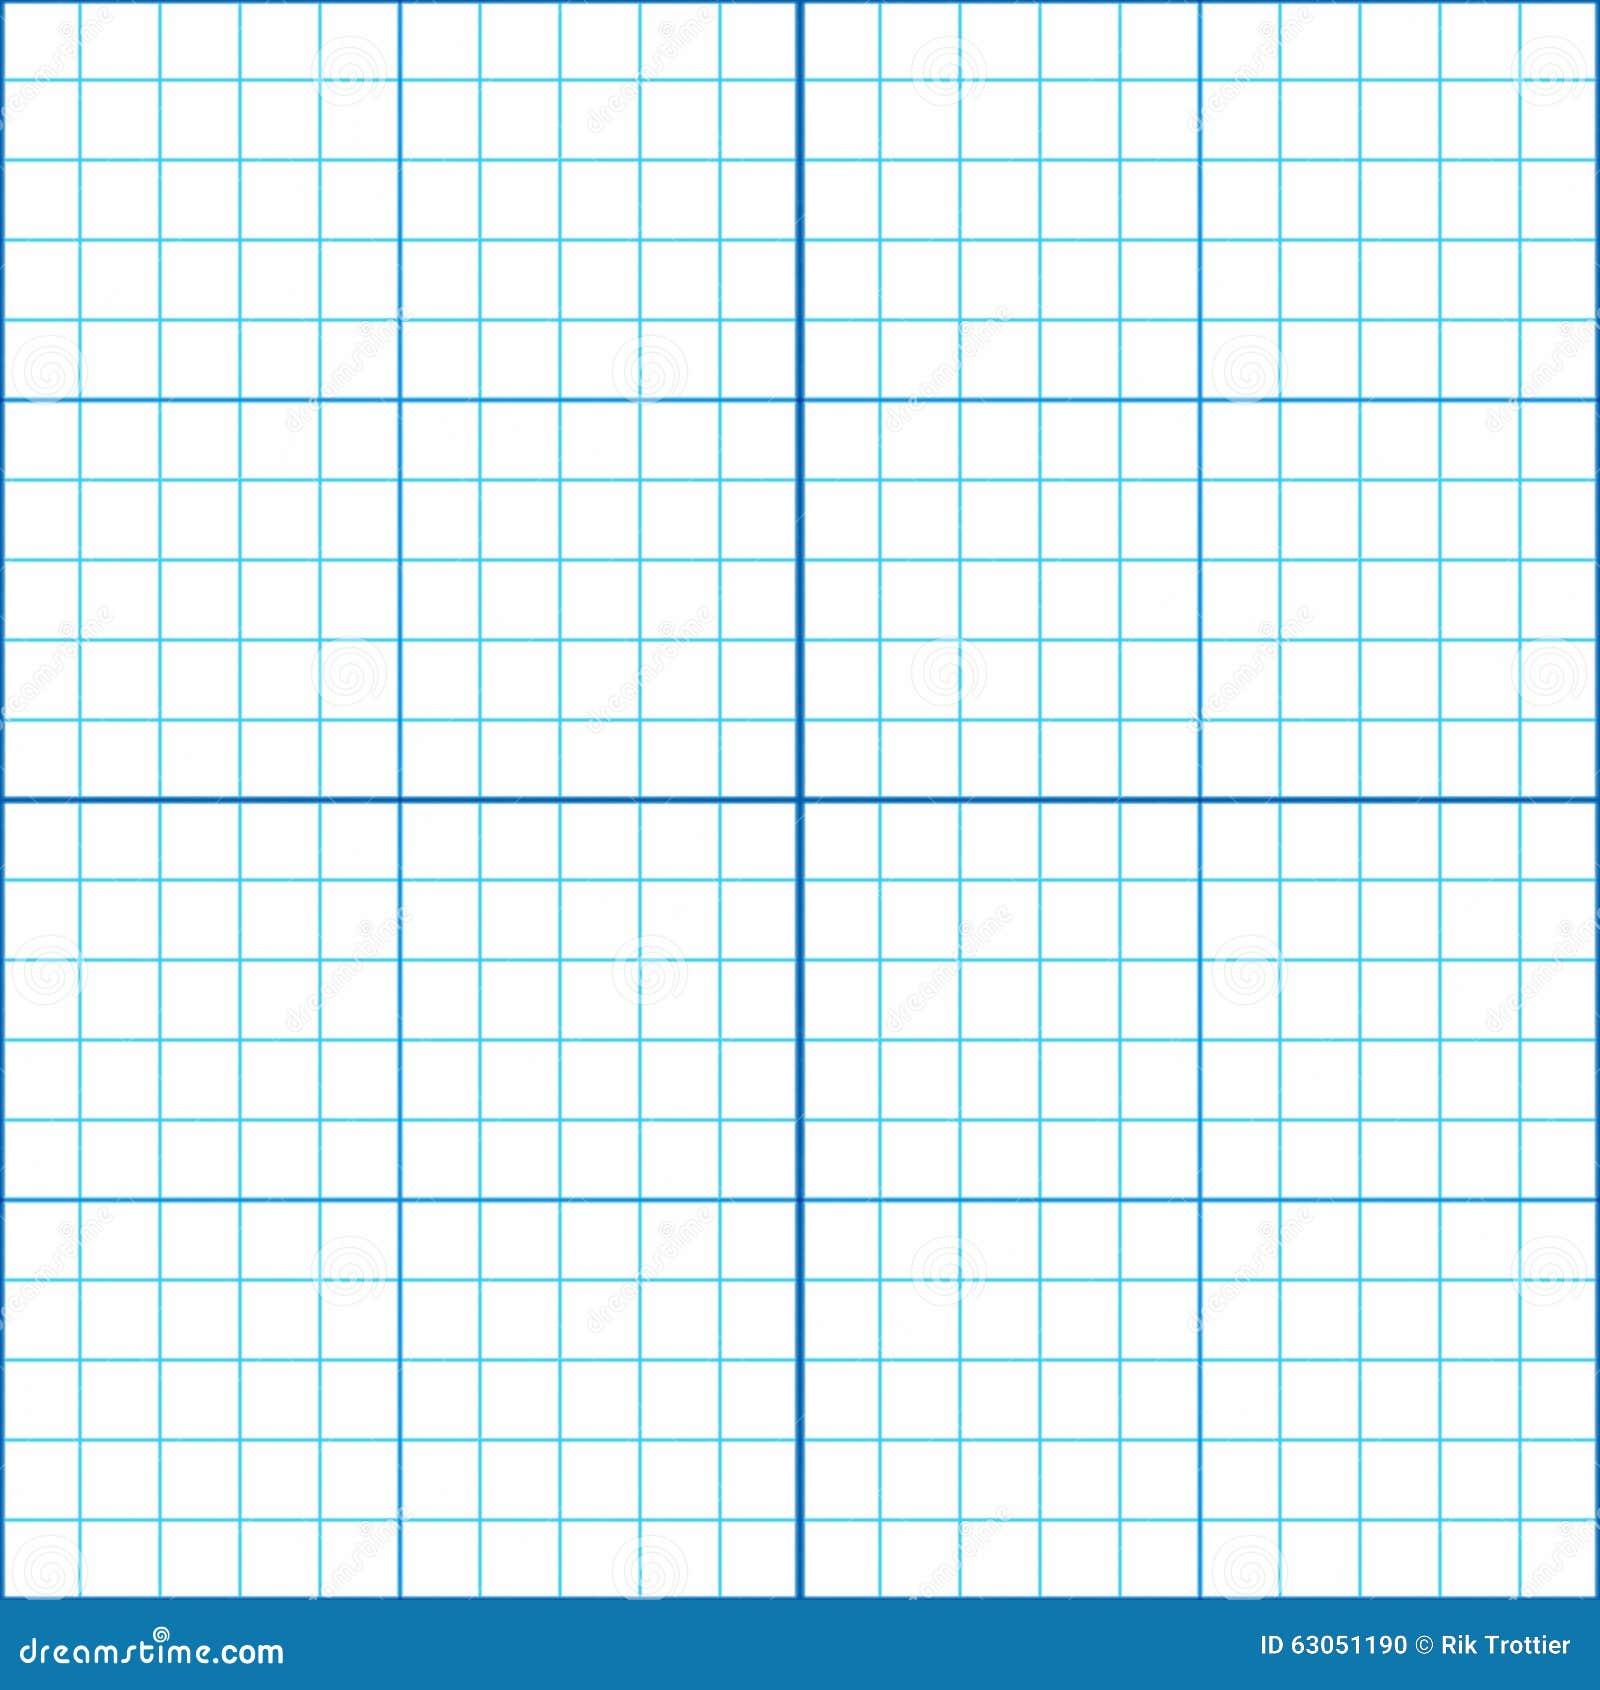 Graph Paper Stock Illustration - Image: 63051190